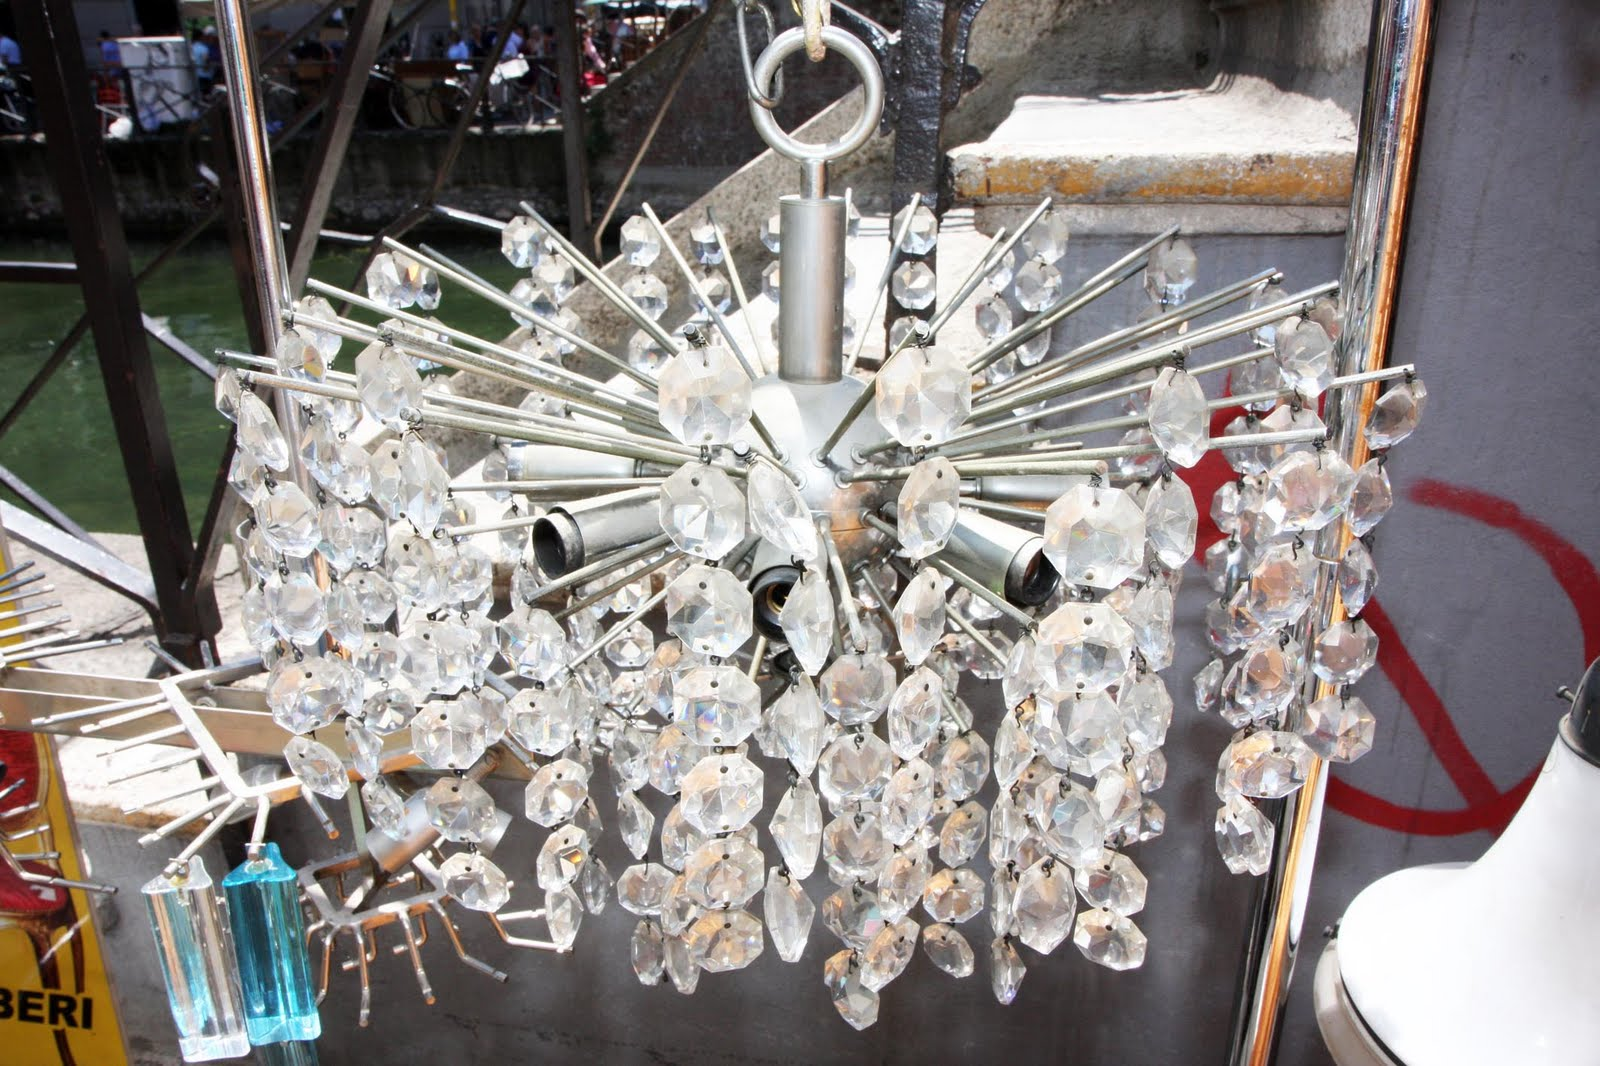 fabbrica lampadari torino : Fabbrica lampadari - Tutte le offerte : Cascare a Fagiolo